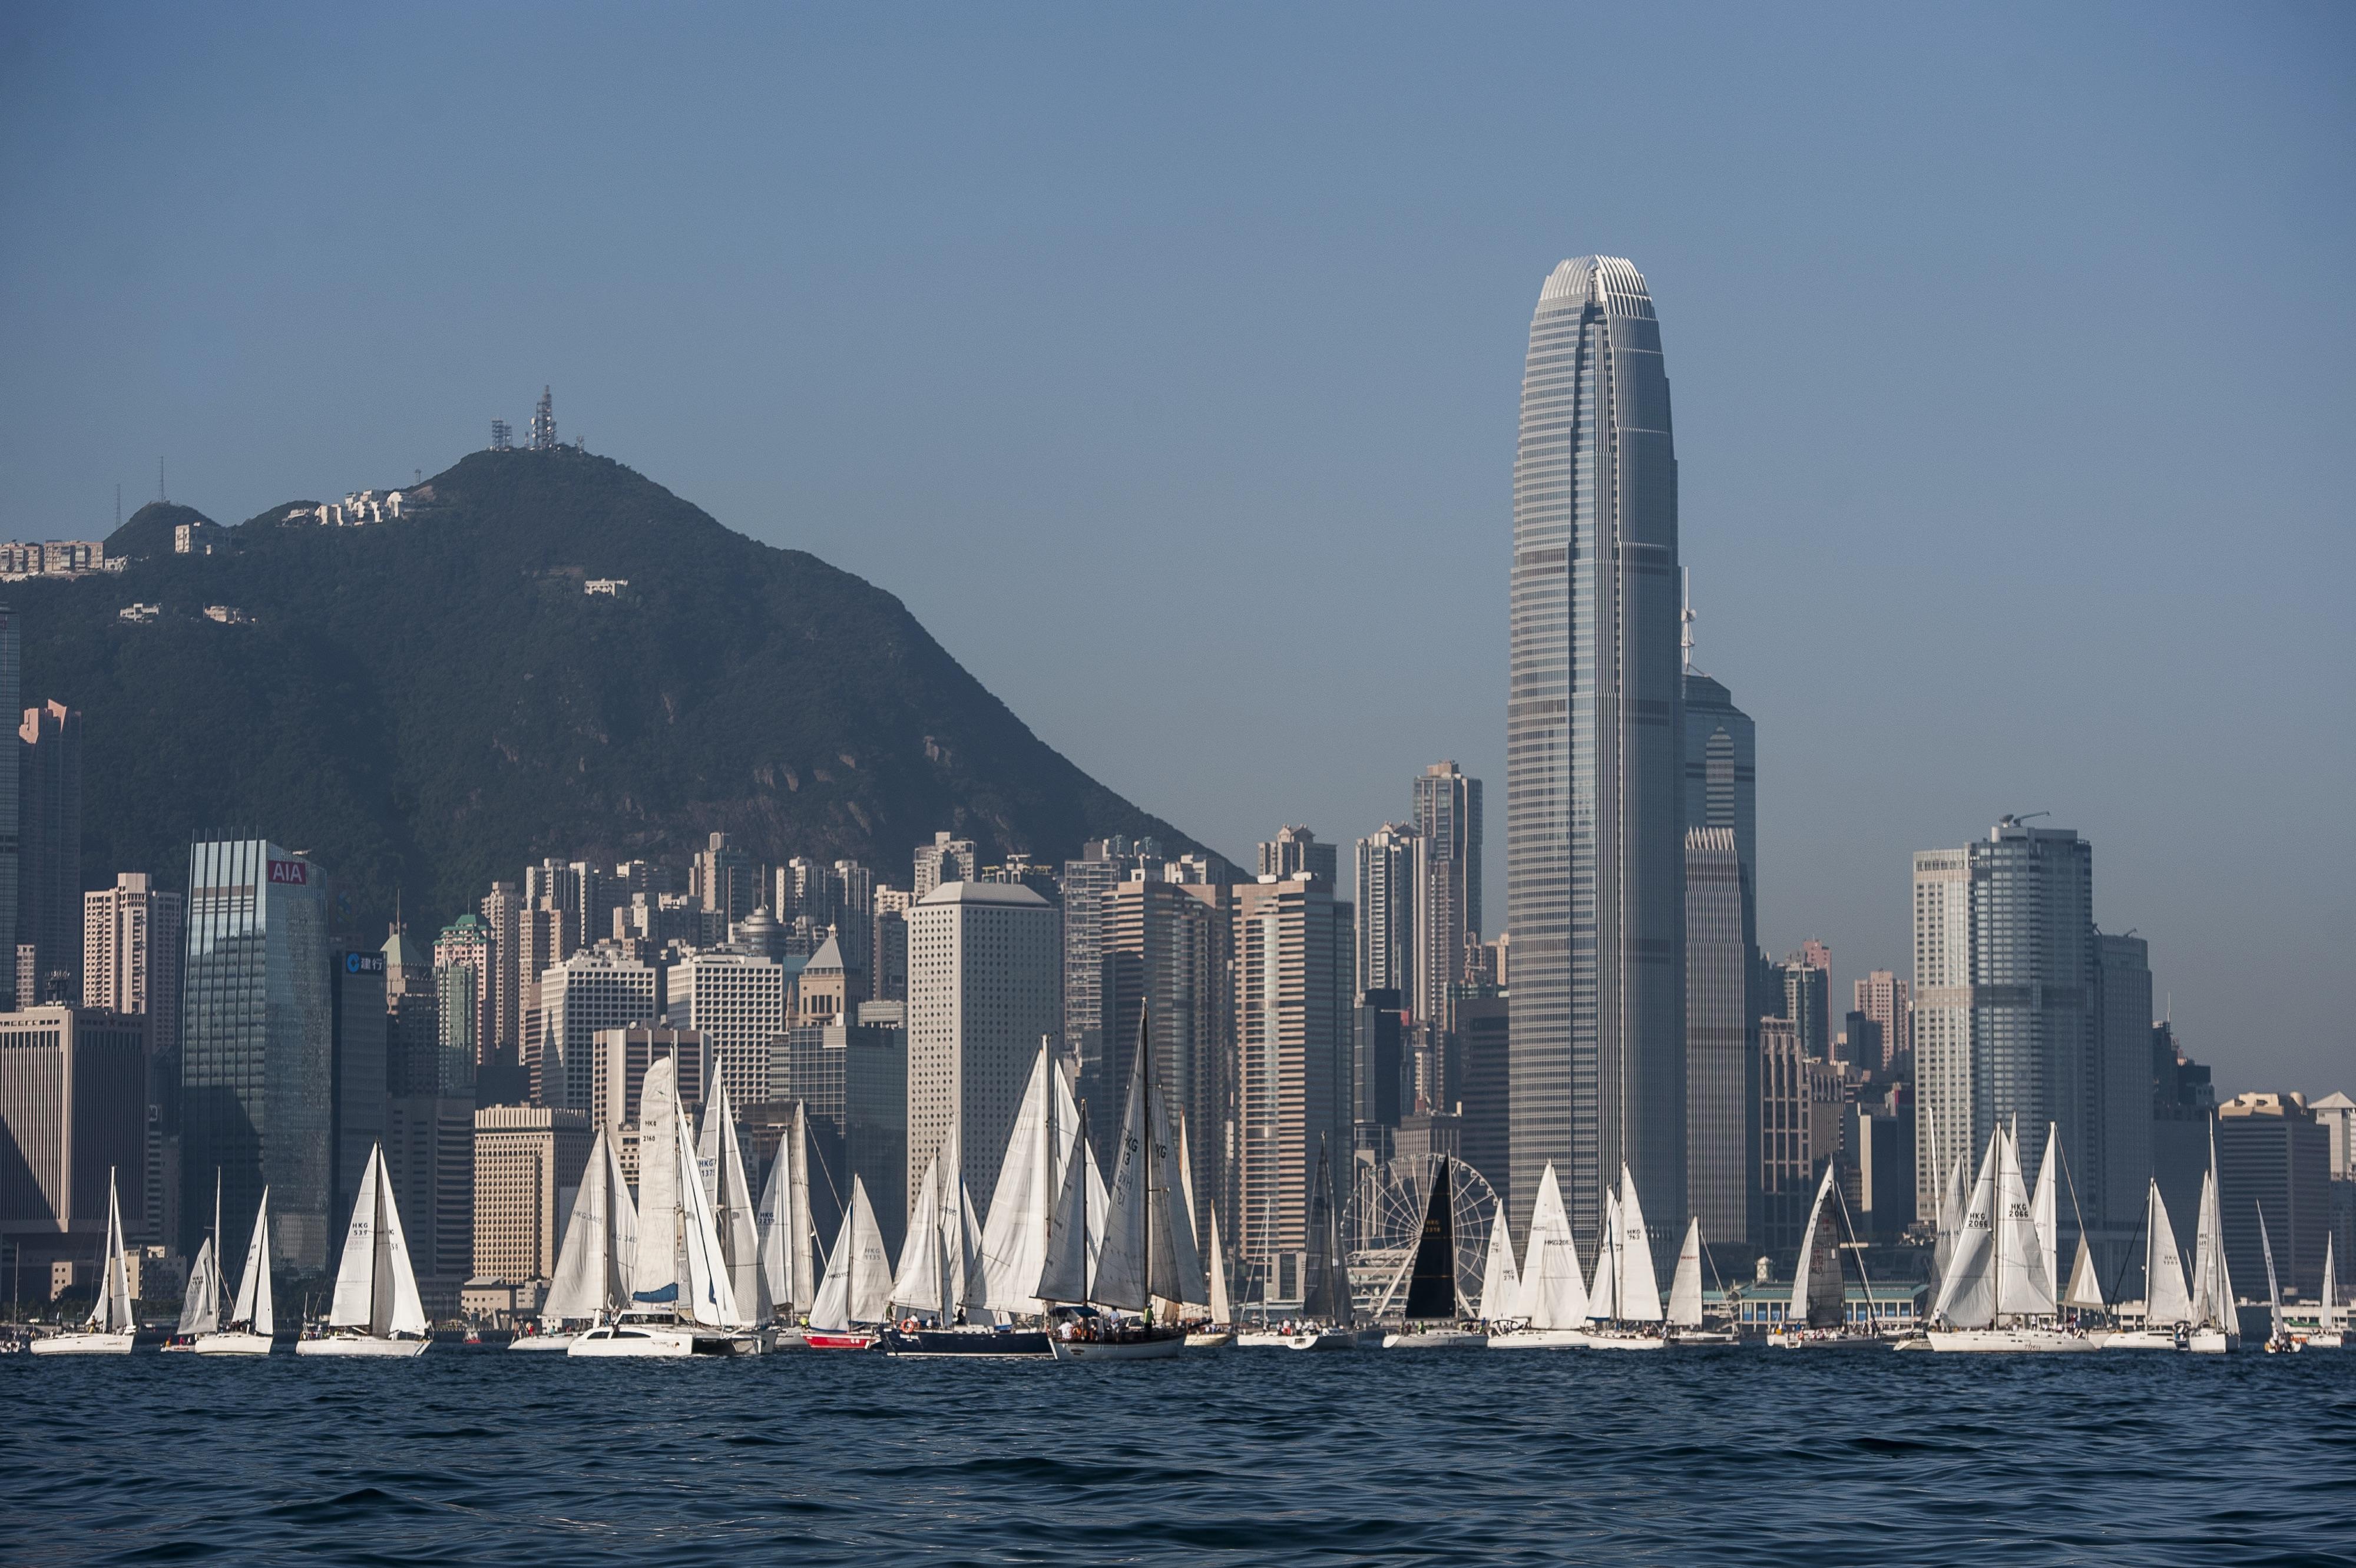 Volvo Ocean Race Hong Kong